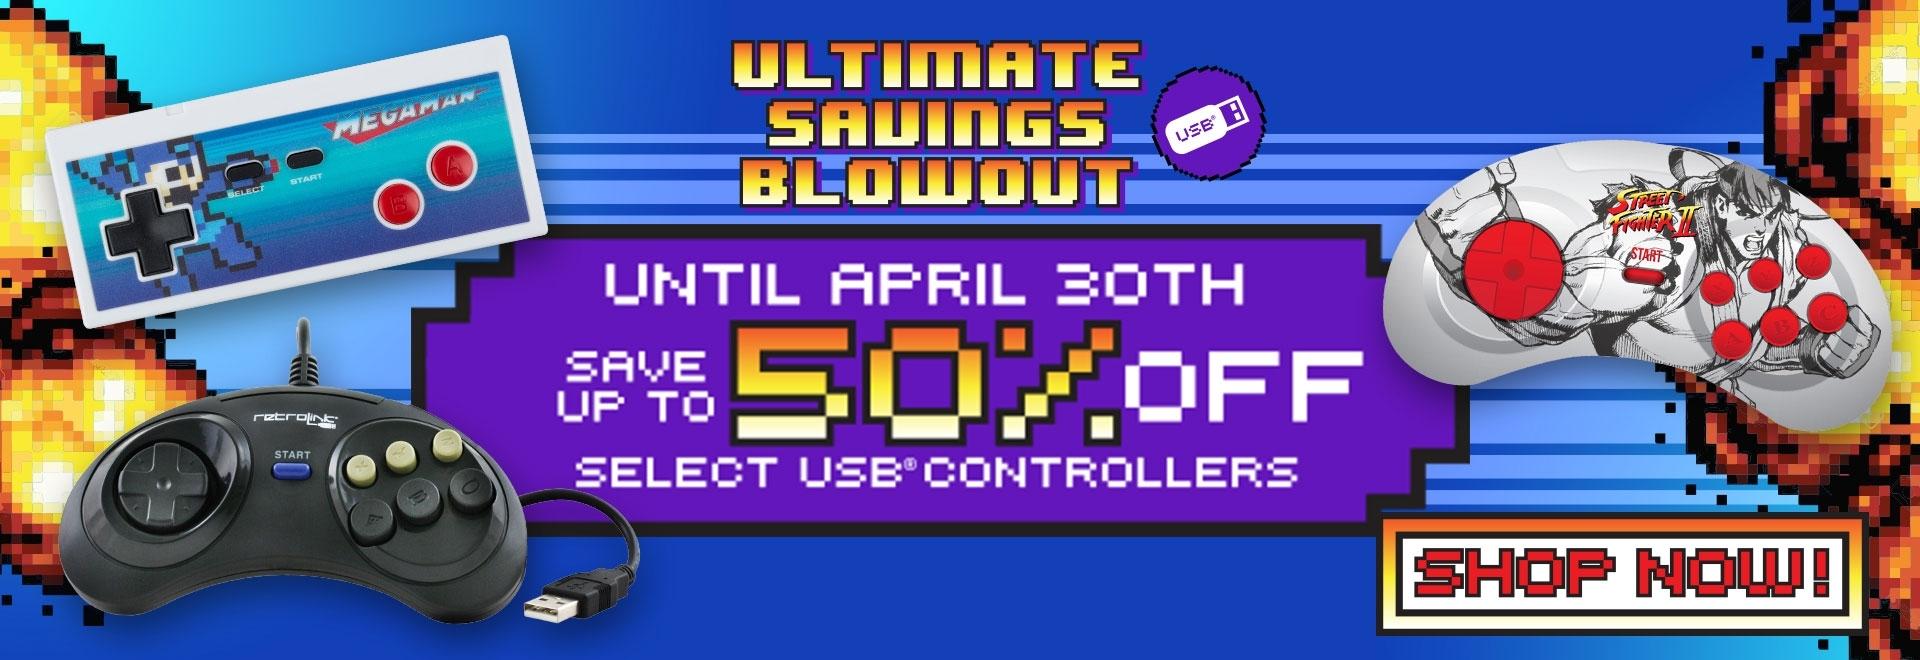 USB: Ultimate Savings Blowout